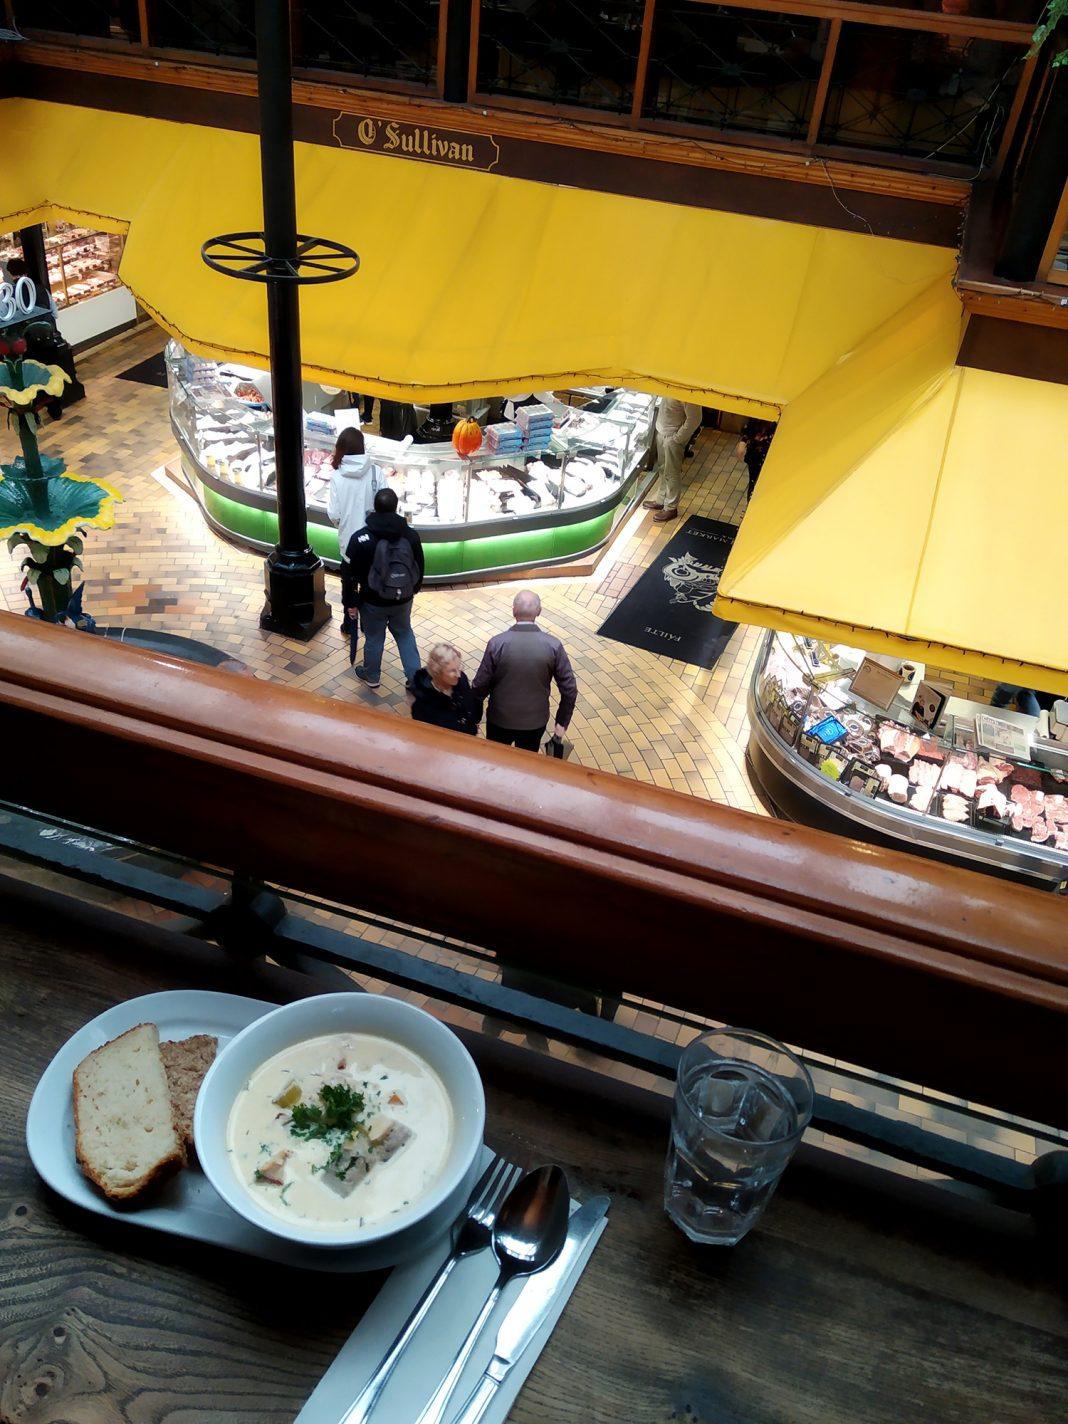 Lunchen bij Farmgate in de English market